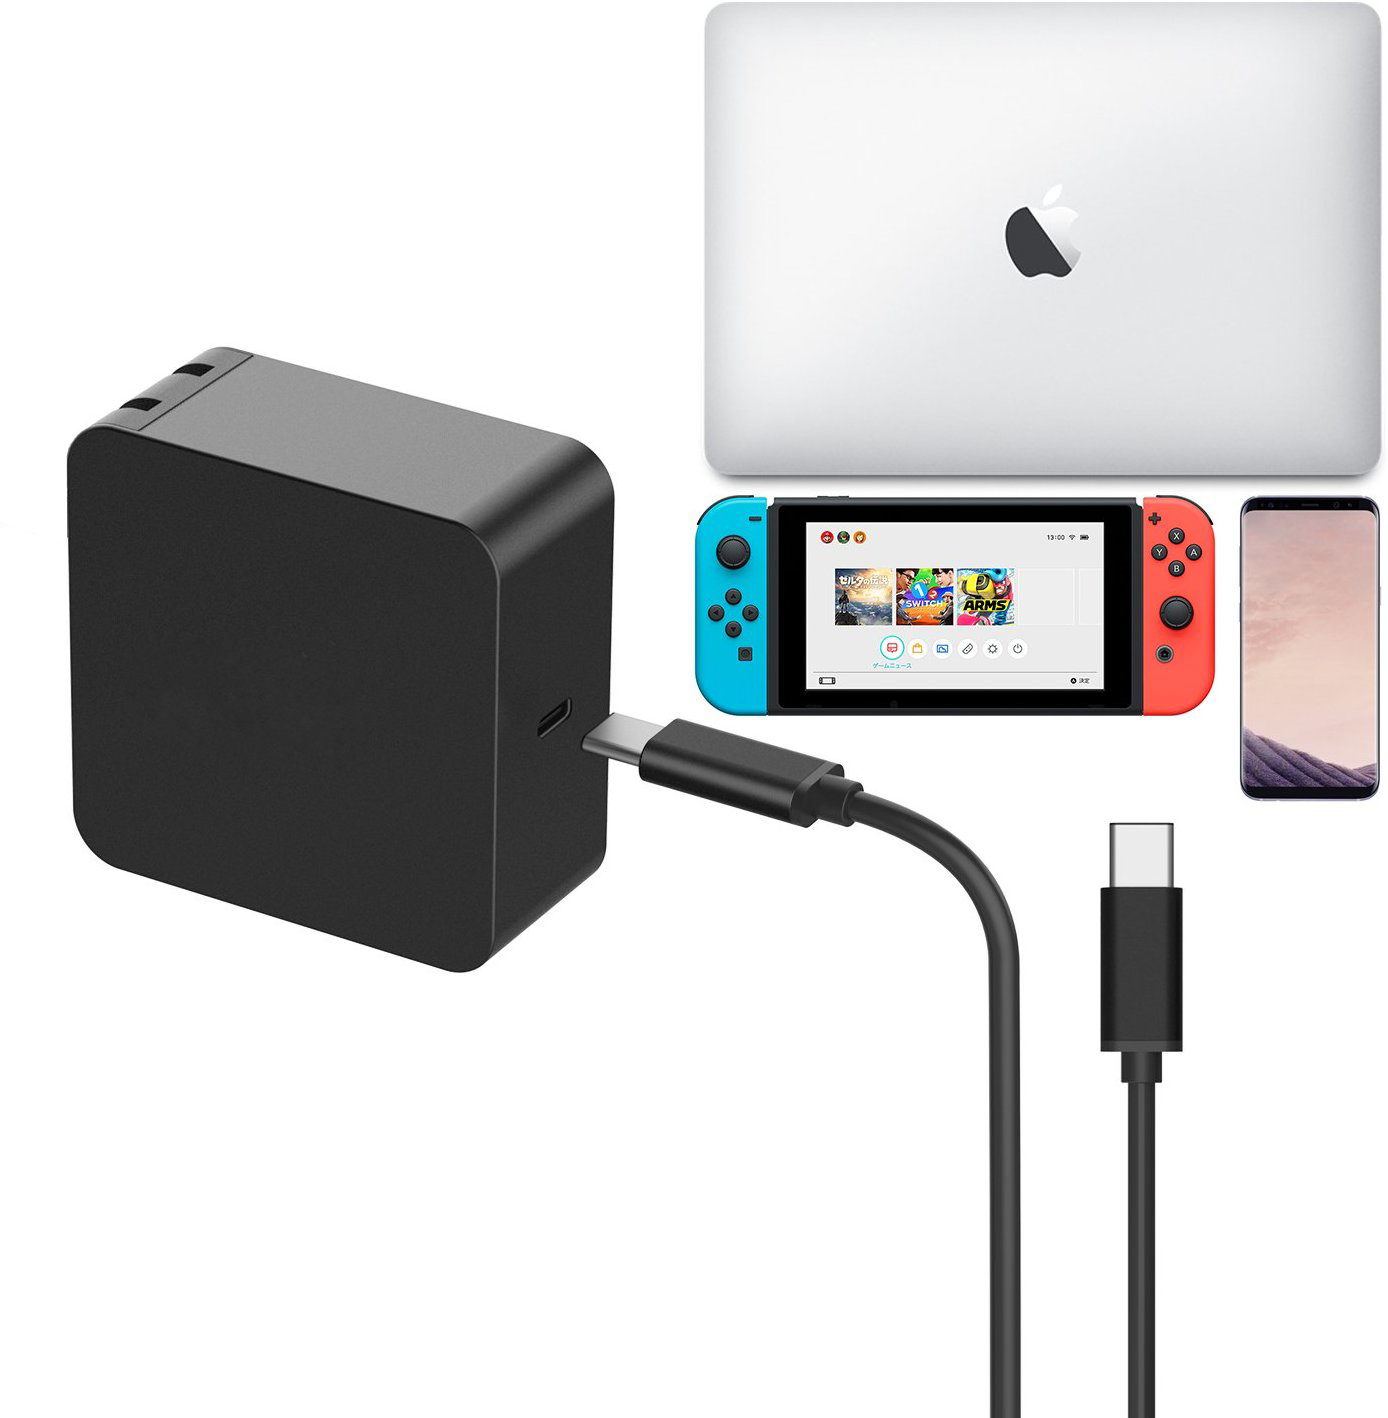 Helper Power Adapter for Macbook touchbar XPS XiaoMi Razer Blade Stealth nintendo switch USB Type C Wall Charger Fast Charging helper 15w 45w 60w usb type c pd wall charger fast charging power adapter for huawei matebook lumia 950 950xl nexus 5x 6p